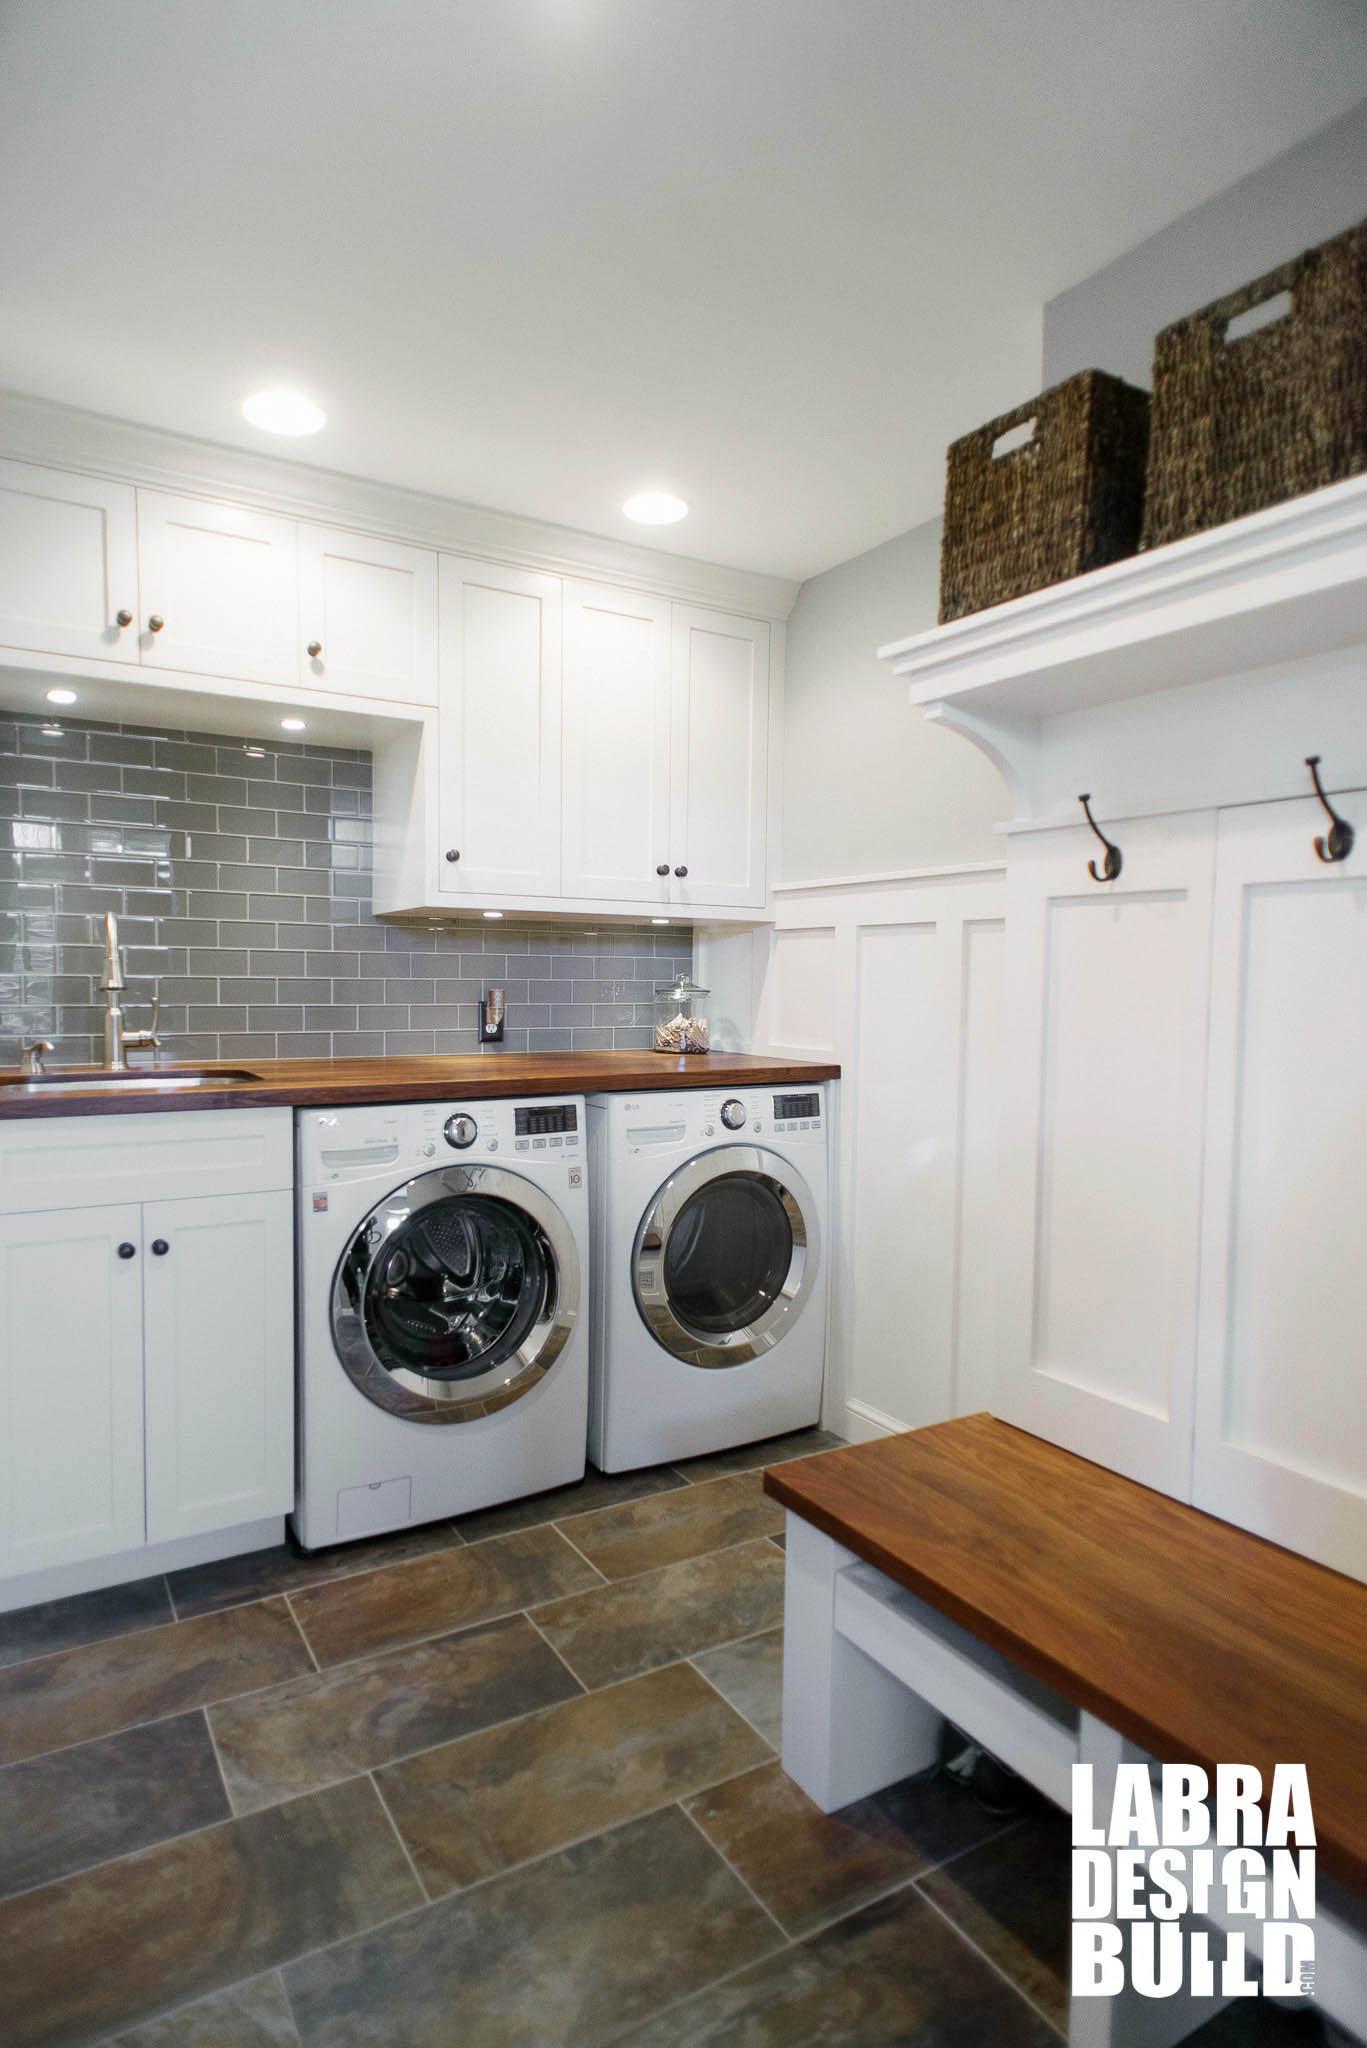 cheap kitchen cabinets michigan floor runner laundry room & mudroom renovation, novi mi labra design build